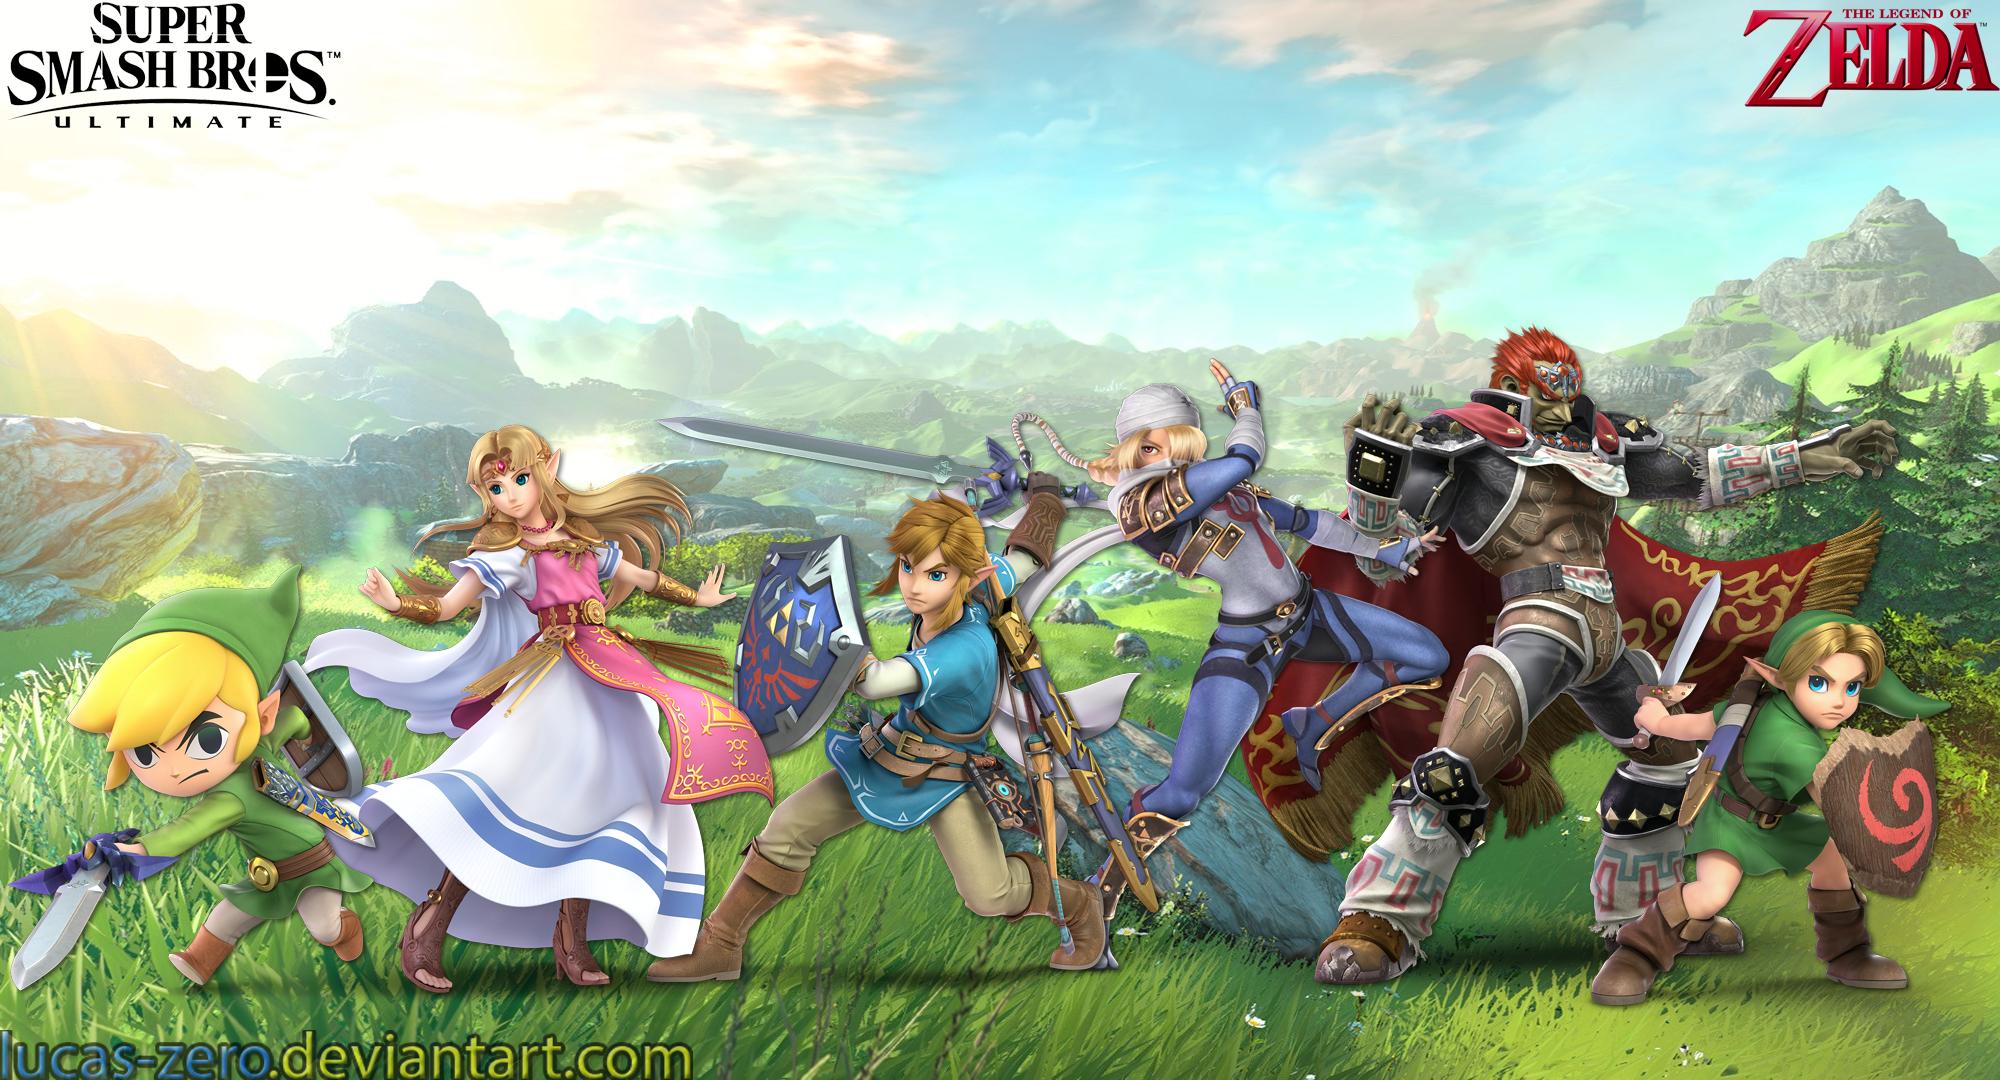 Zelda Super Smash Bros Ultimate Wallpaper By Lucas Zero On Deviantart